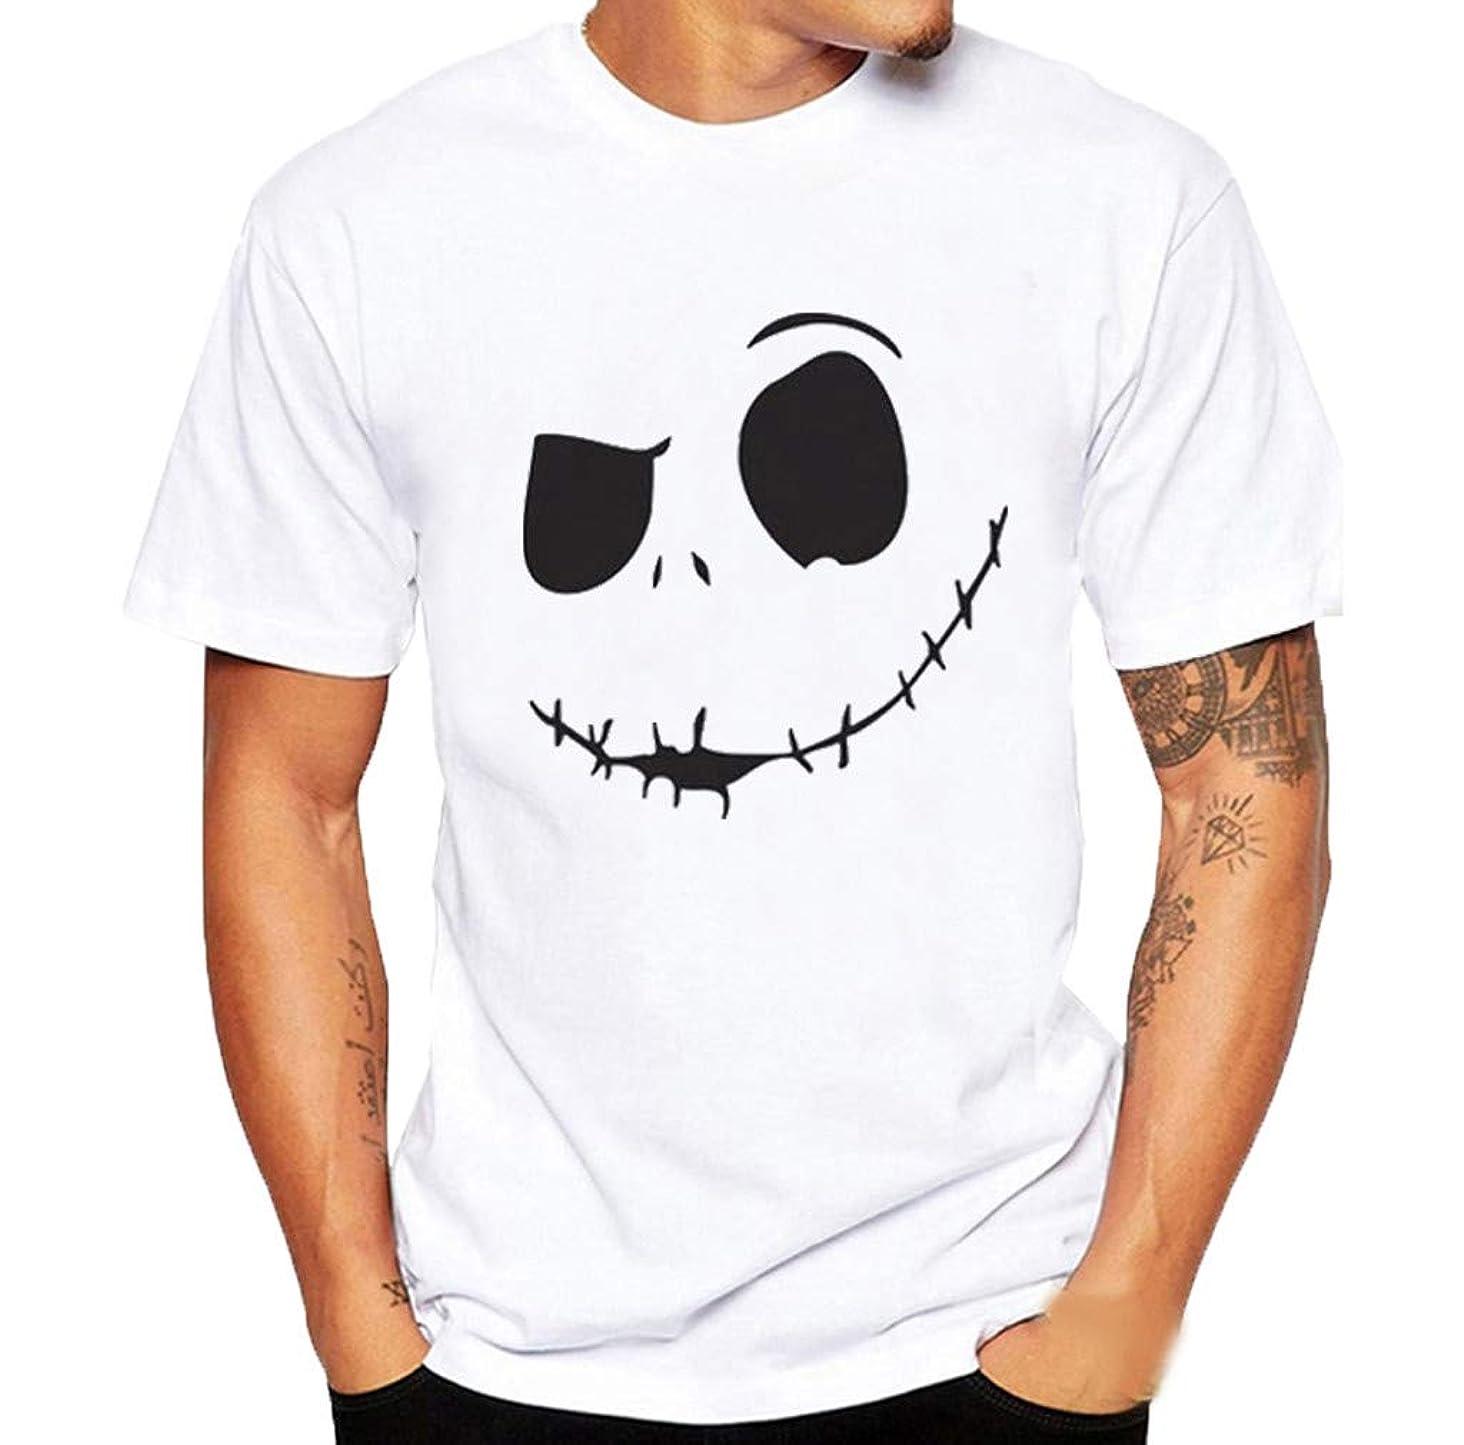 Ximandi Men's Summer Evil Smile Face Printed Round-Collar Comfortable T-shirt Tops